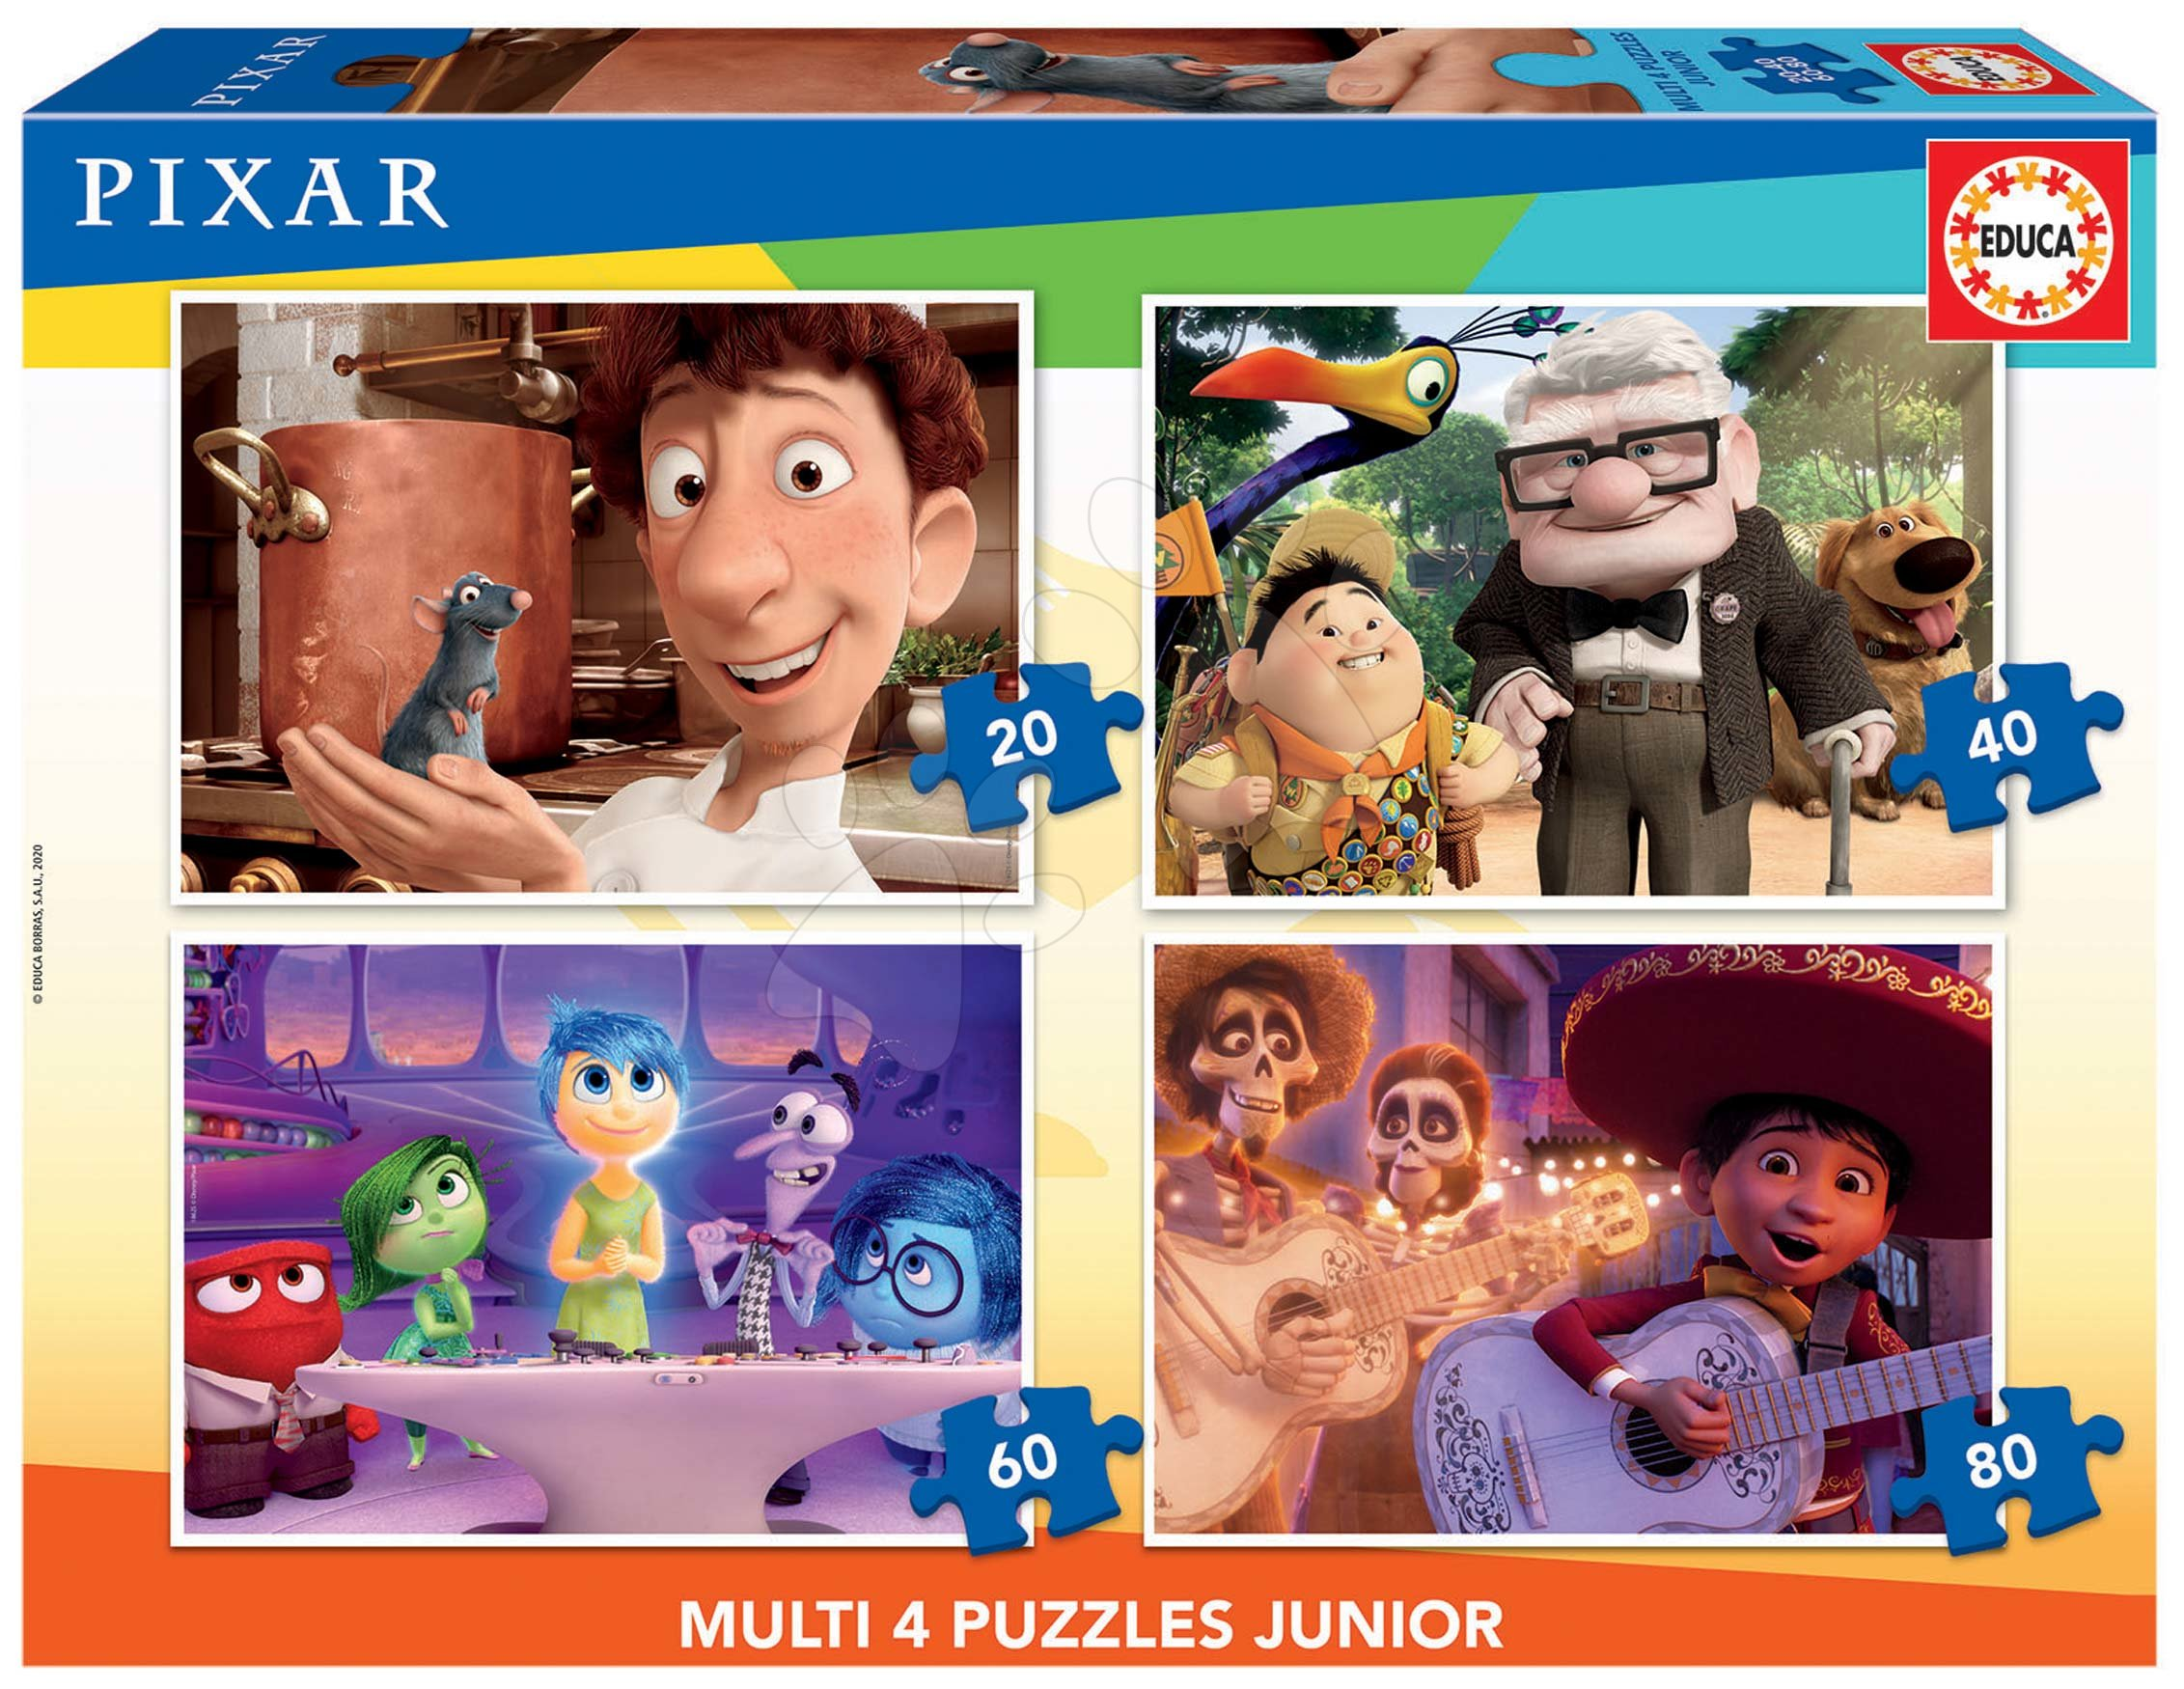 Puzzle Pixar 2 Disney Multi 4 Junior Educa 20-40-60-80 dílků od 4 let